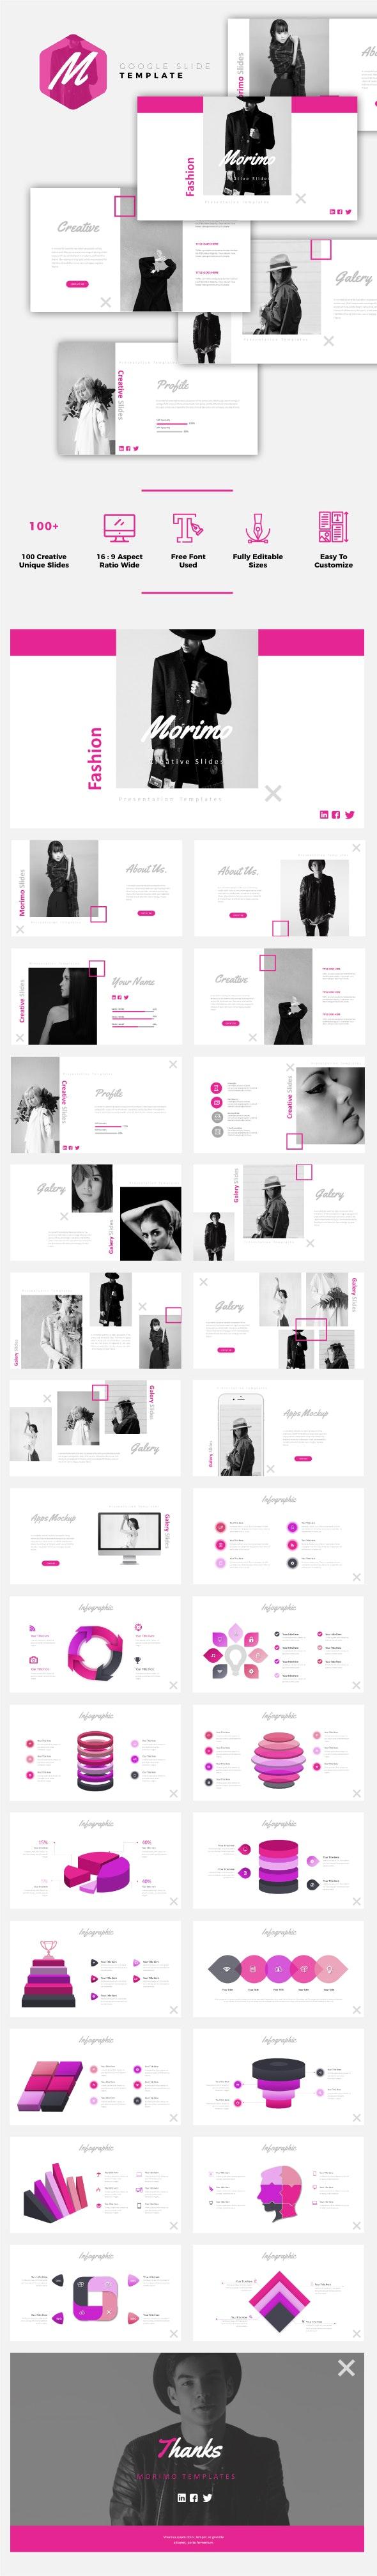 Morimo - Fashion Google Slides Template - Google Slides Presentation Templates